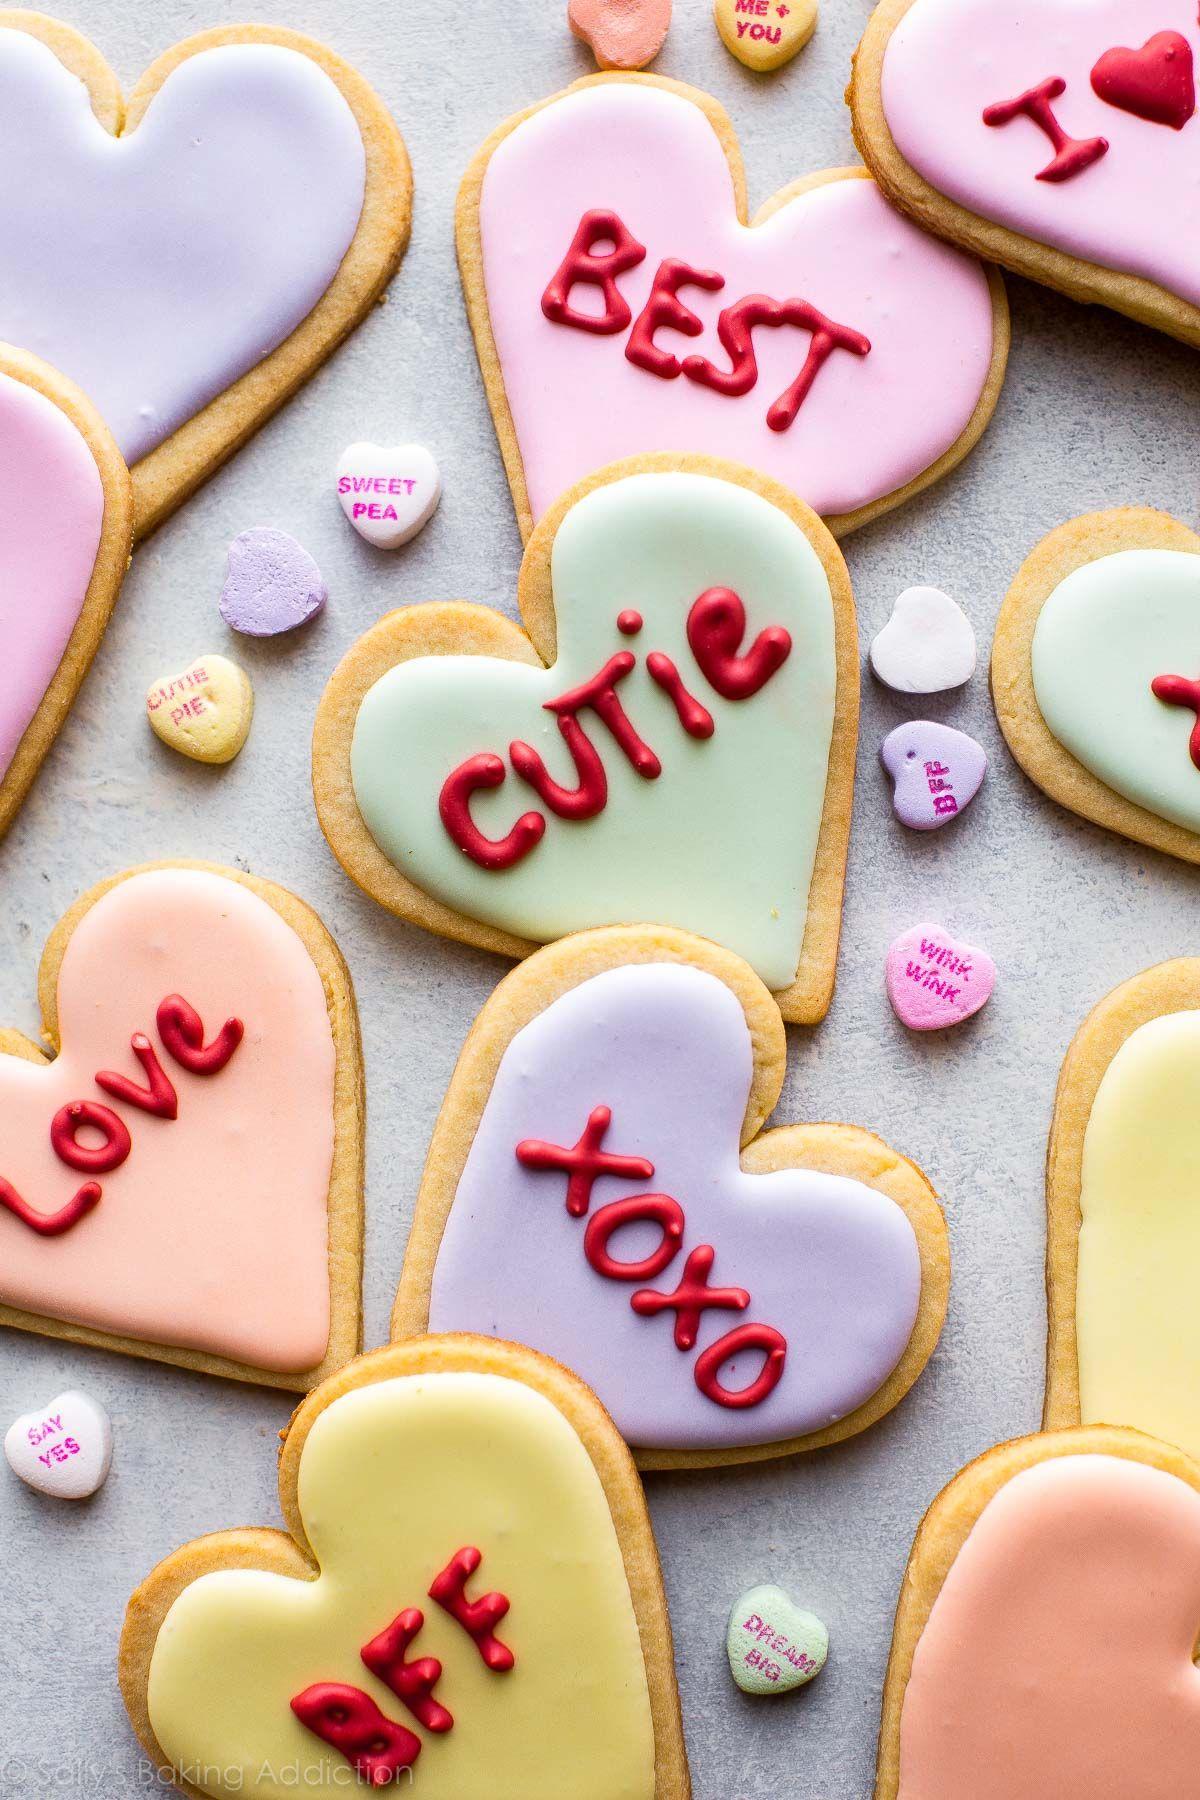 decorated conversation heart sugar cookies for valentine s day recipe on sallysbakingaddiction c valentine sugar cookies heart sugar cookie valentine desserts decorated conversation heart sugar